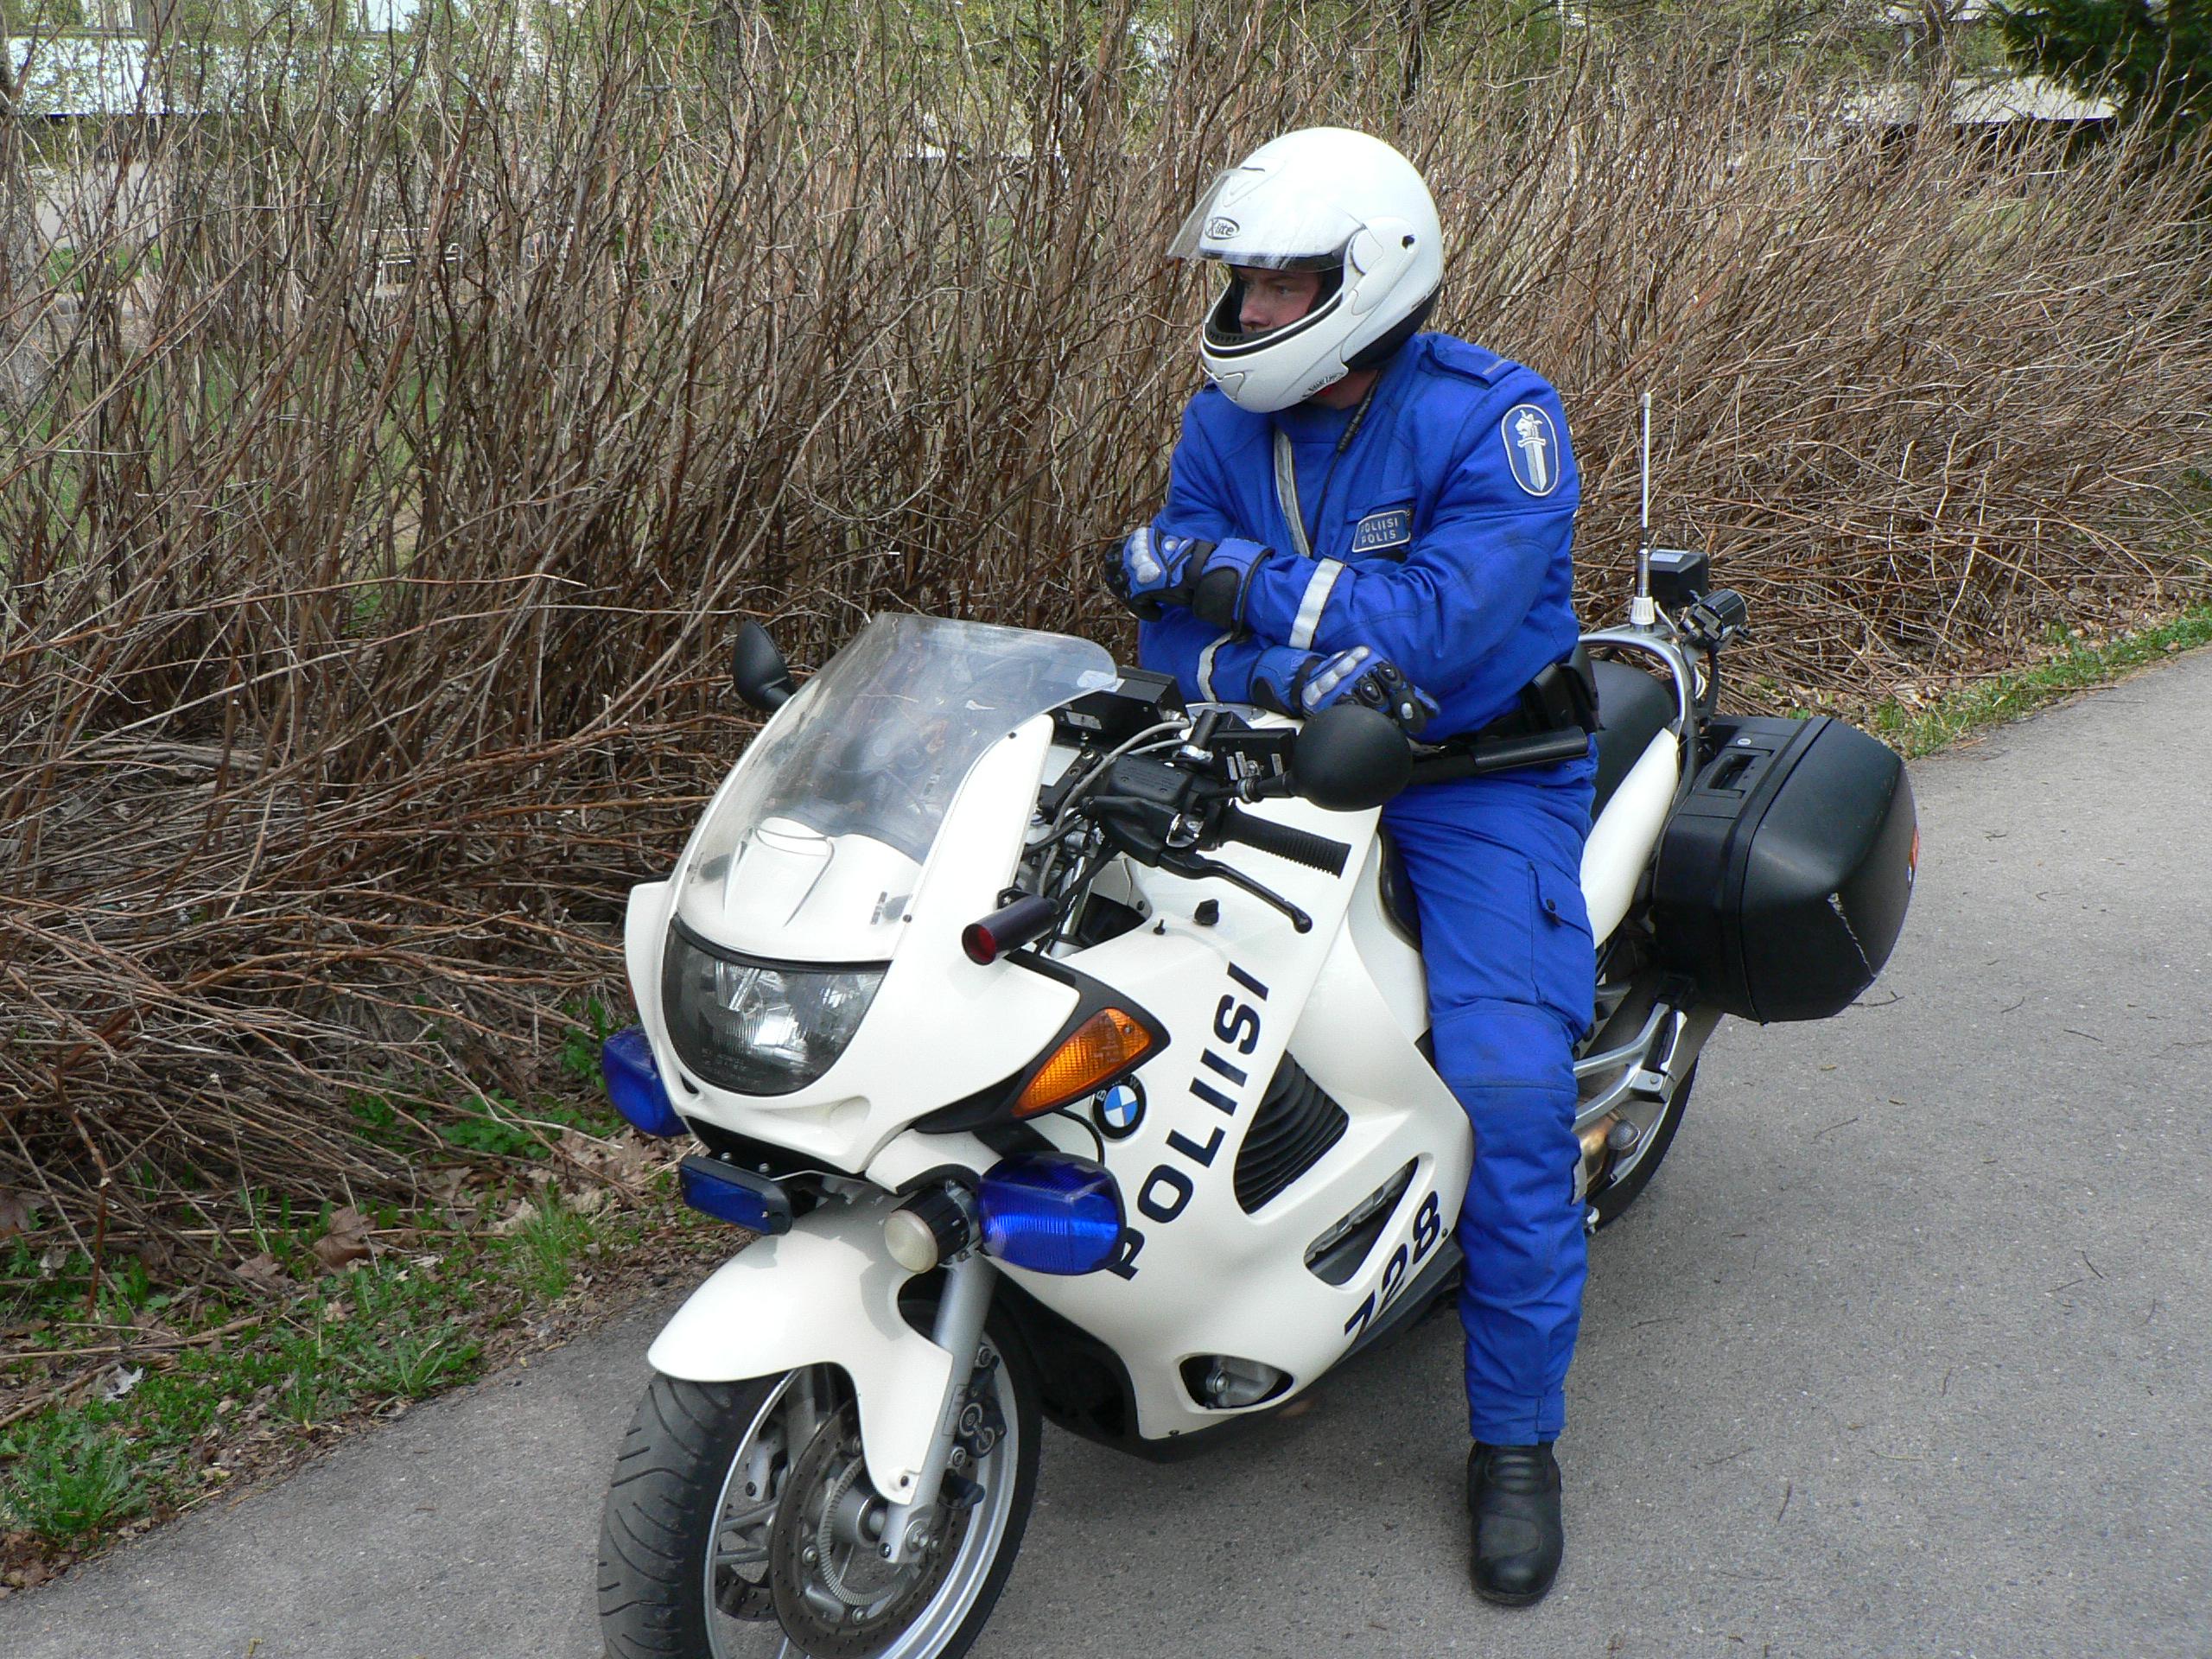 Police motorcycle in Finland.JPG